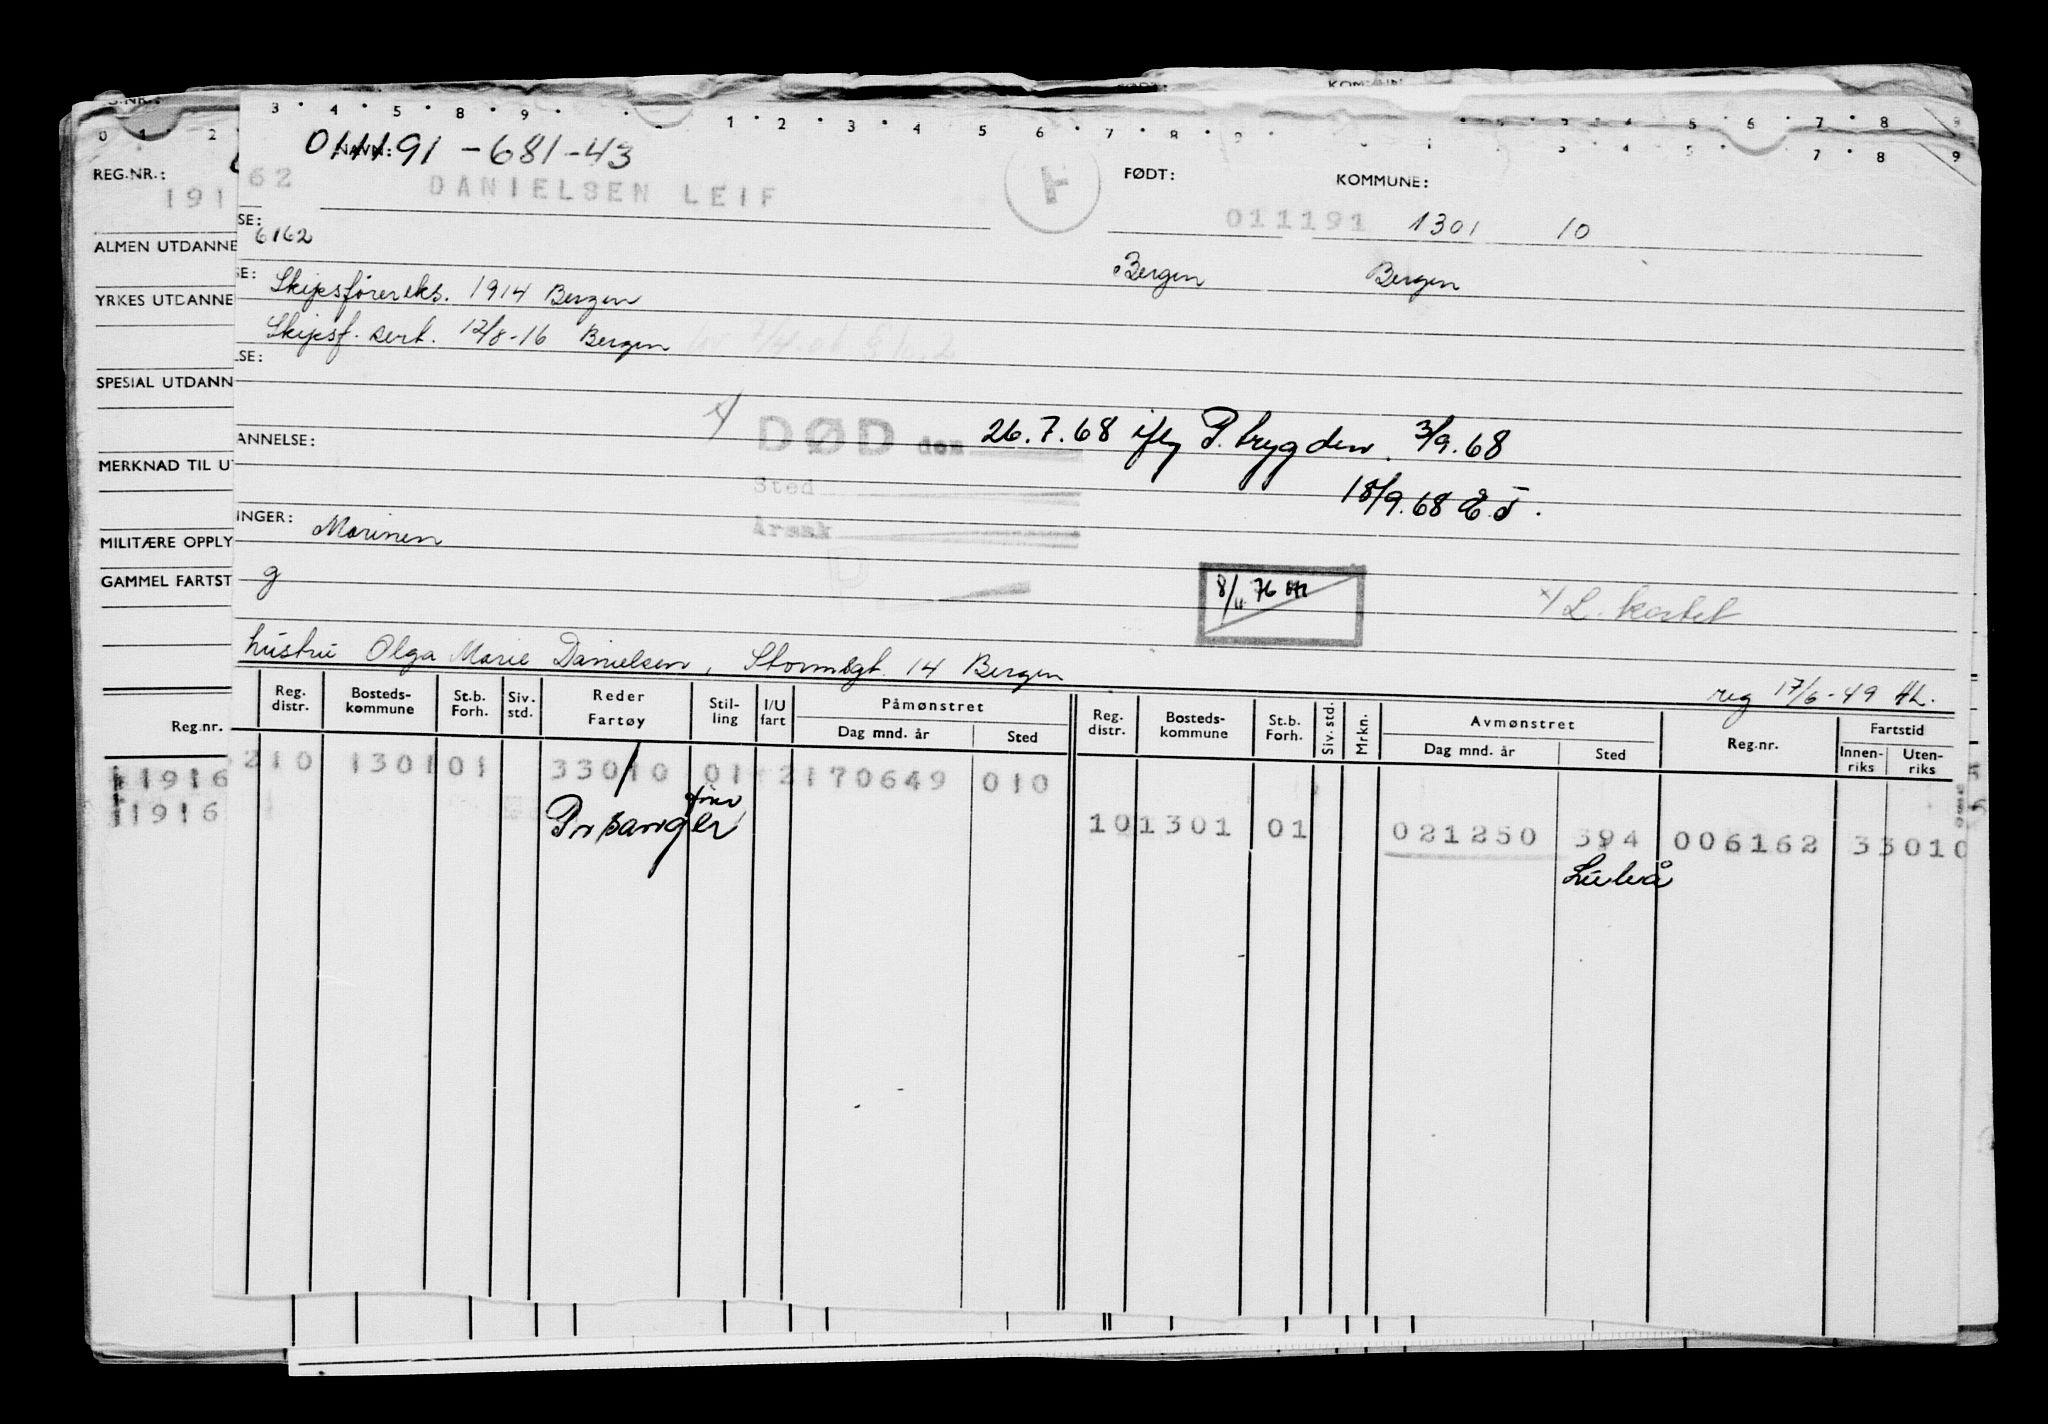 RA, Direktoratet for sjømenn, G/Gb/L0010: Hovedkort, 1891-1892, s. 226